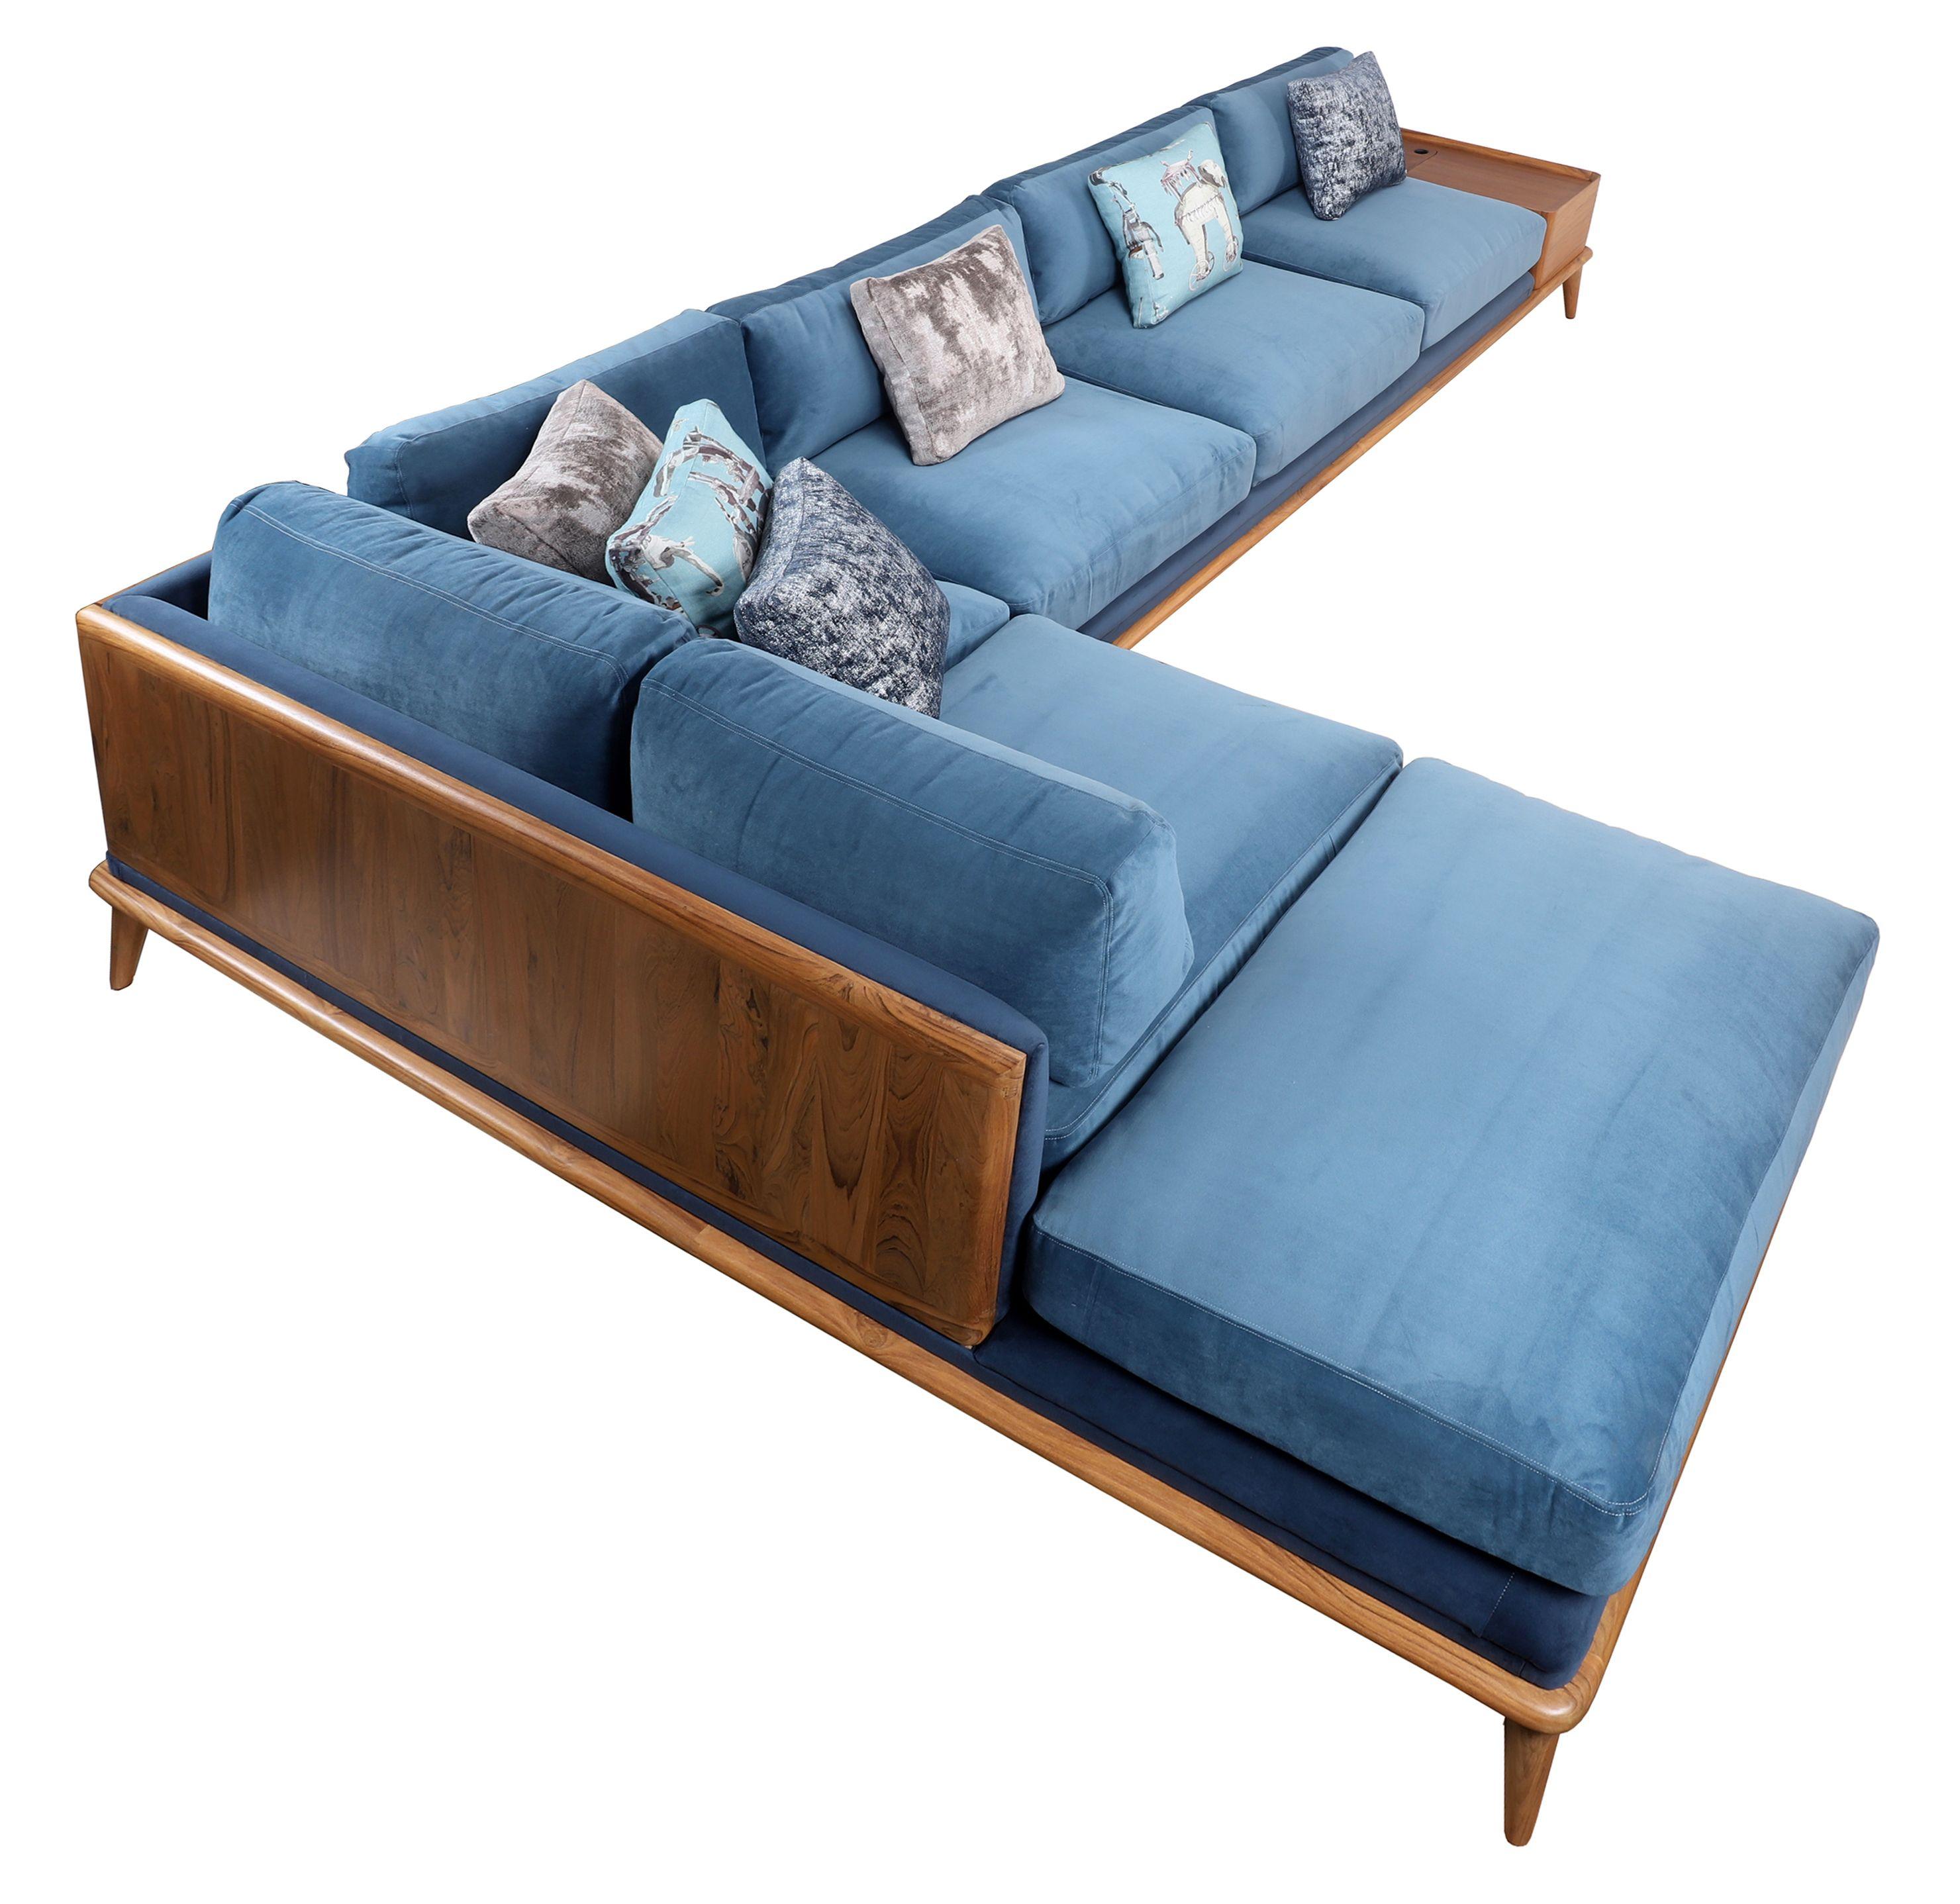 Mysig L Shaped Sofa A Round Edged Sofa Sofa Design L Shaped